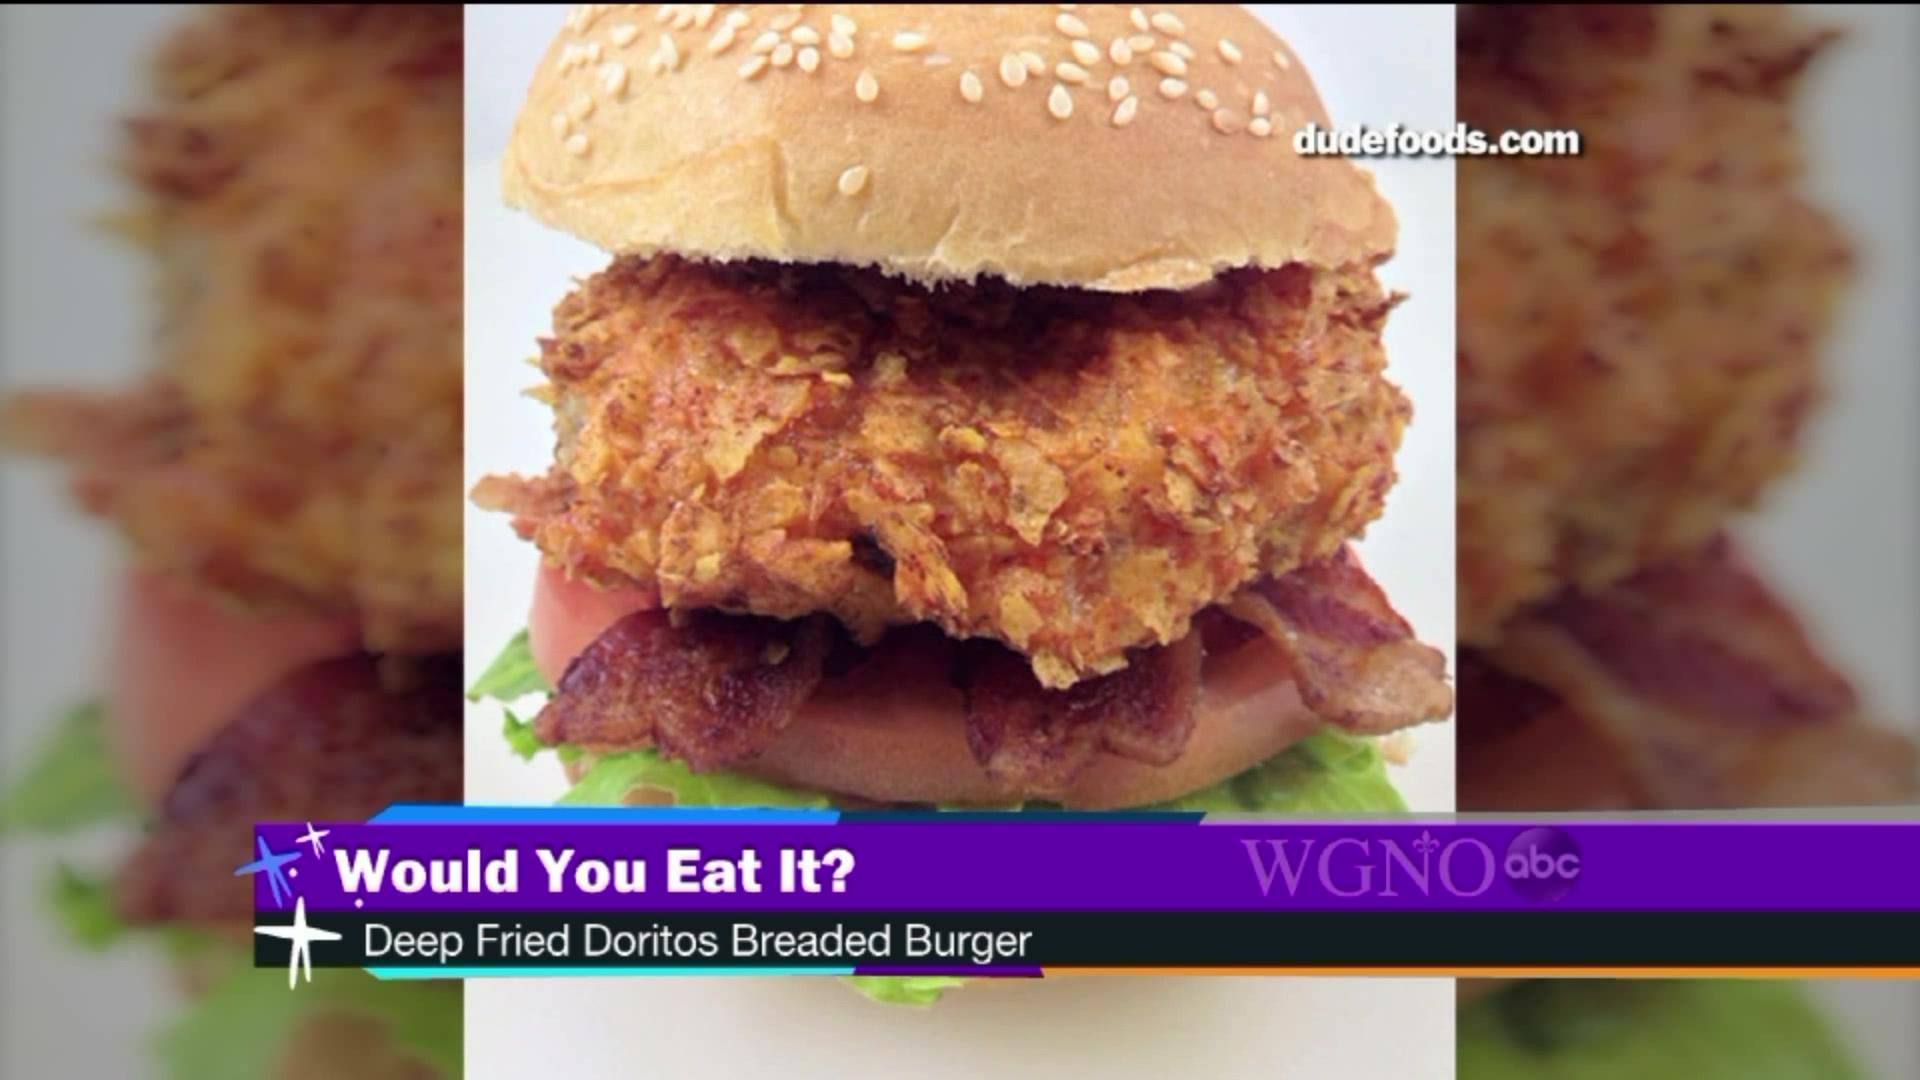 Would You Eat It? Deep Friend Doritos Breaded Burger